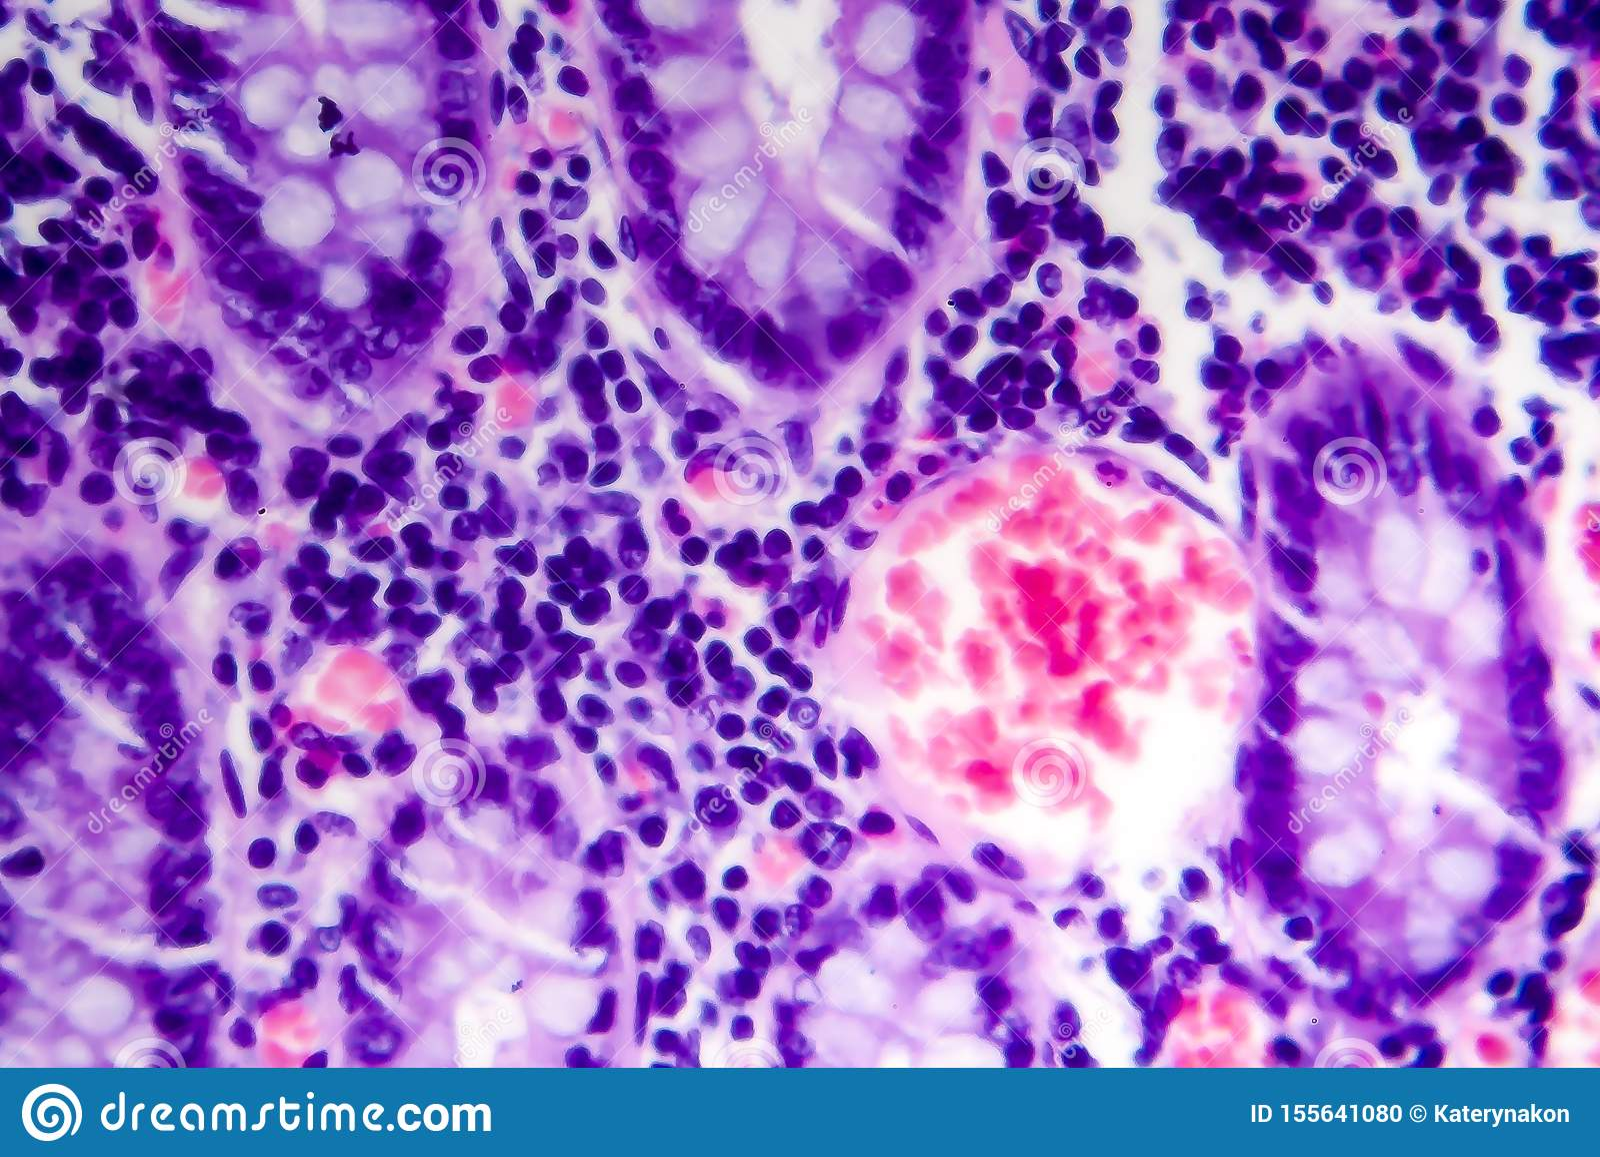 Adenocarcinoma intestinal mal distinguida, micrográfo ligero